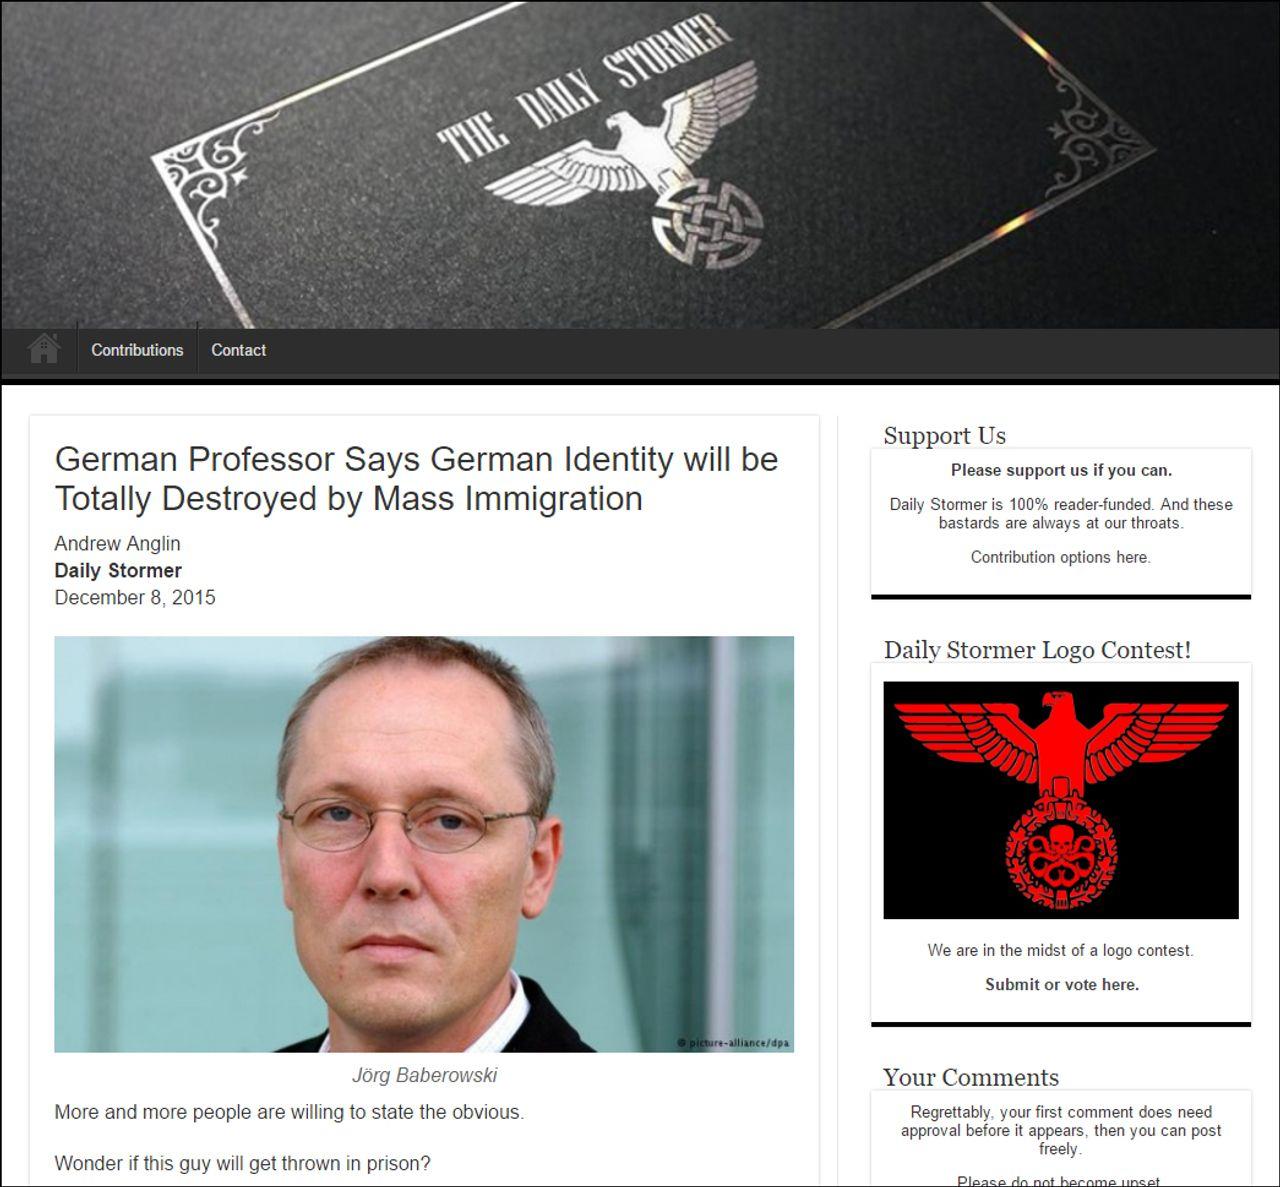 United States Daily Stormer nazis promote Baberowski